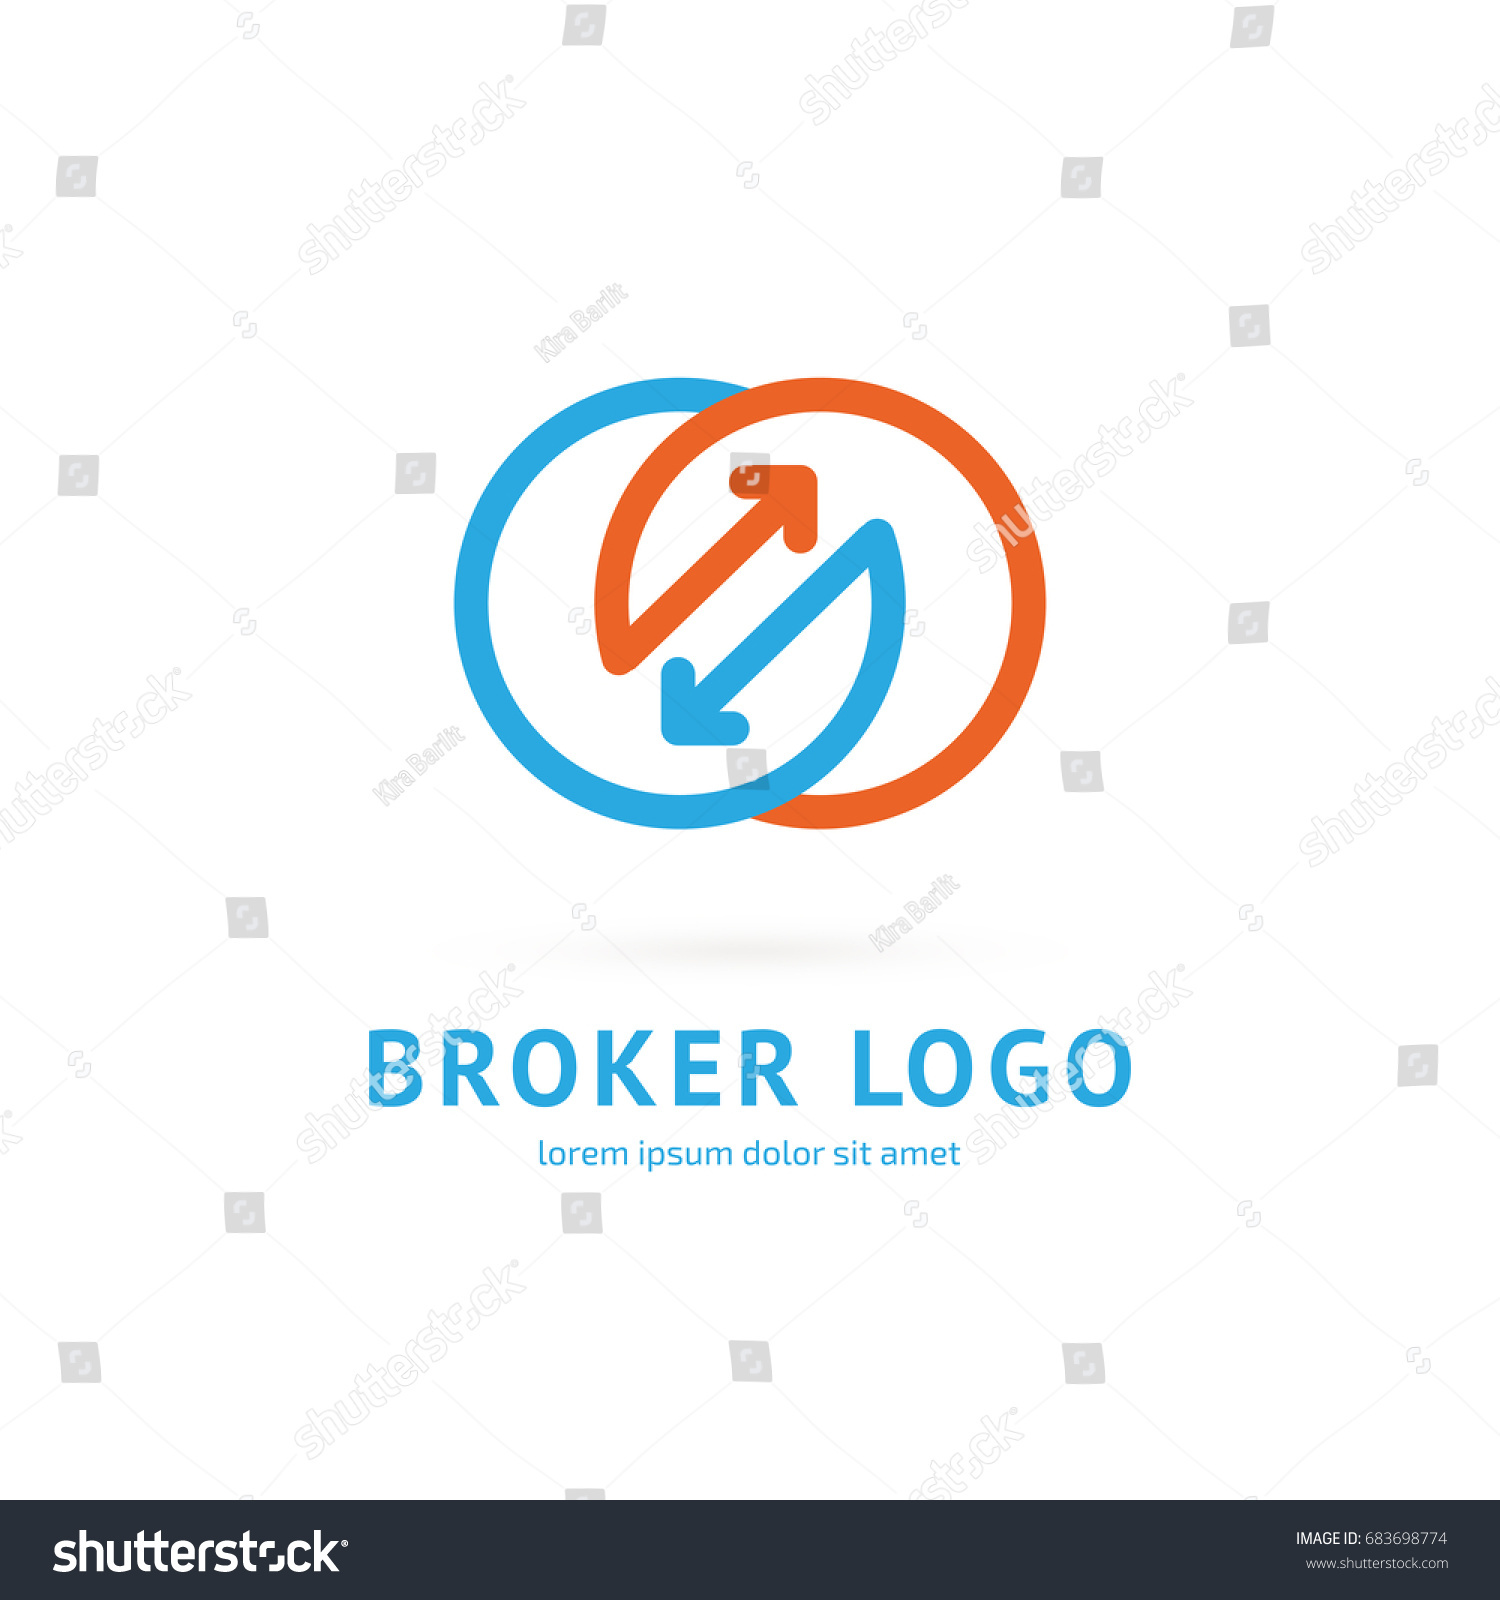 Logo Design Broker Vector Template Illustration Vector de stock ...